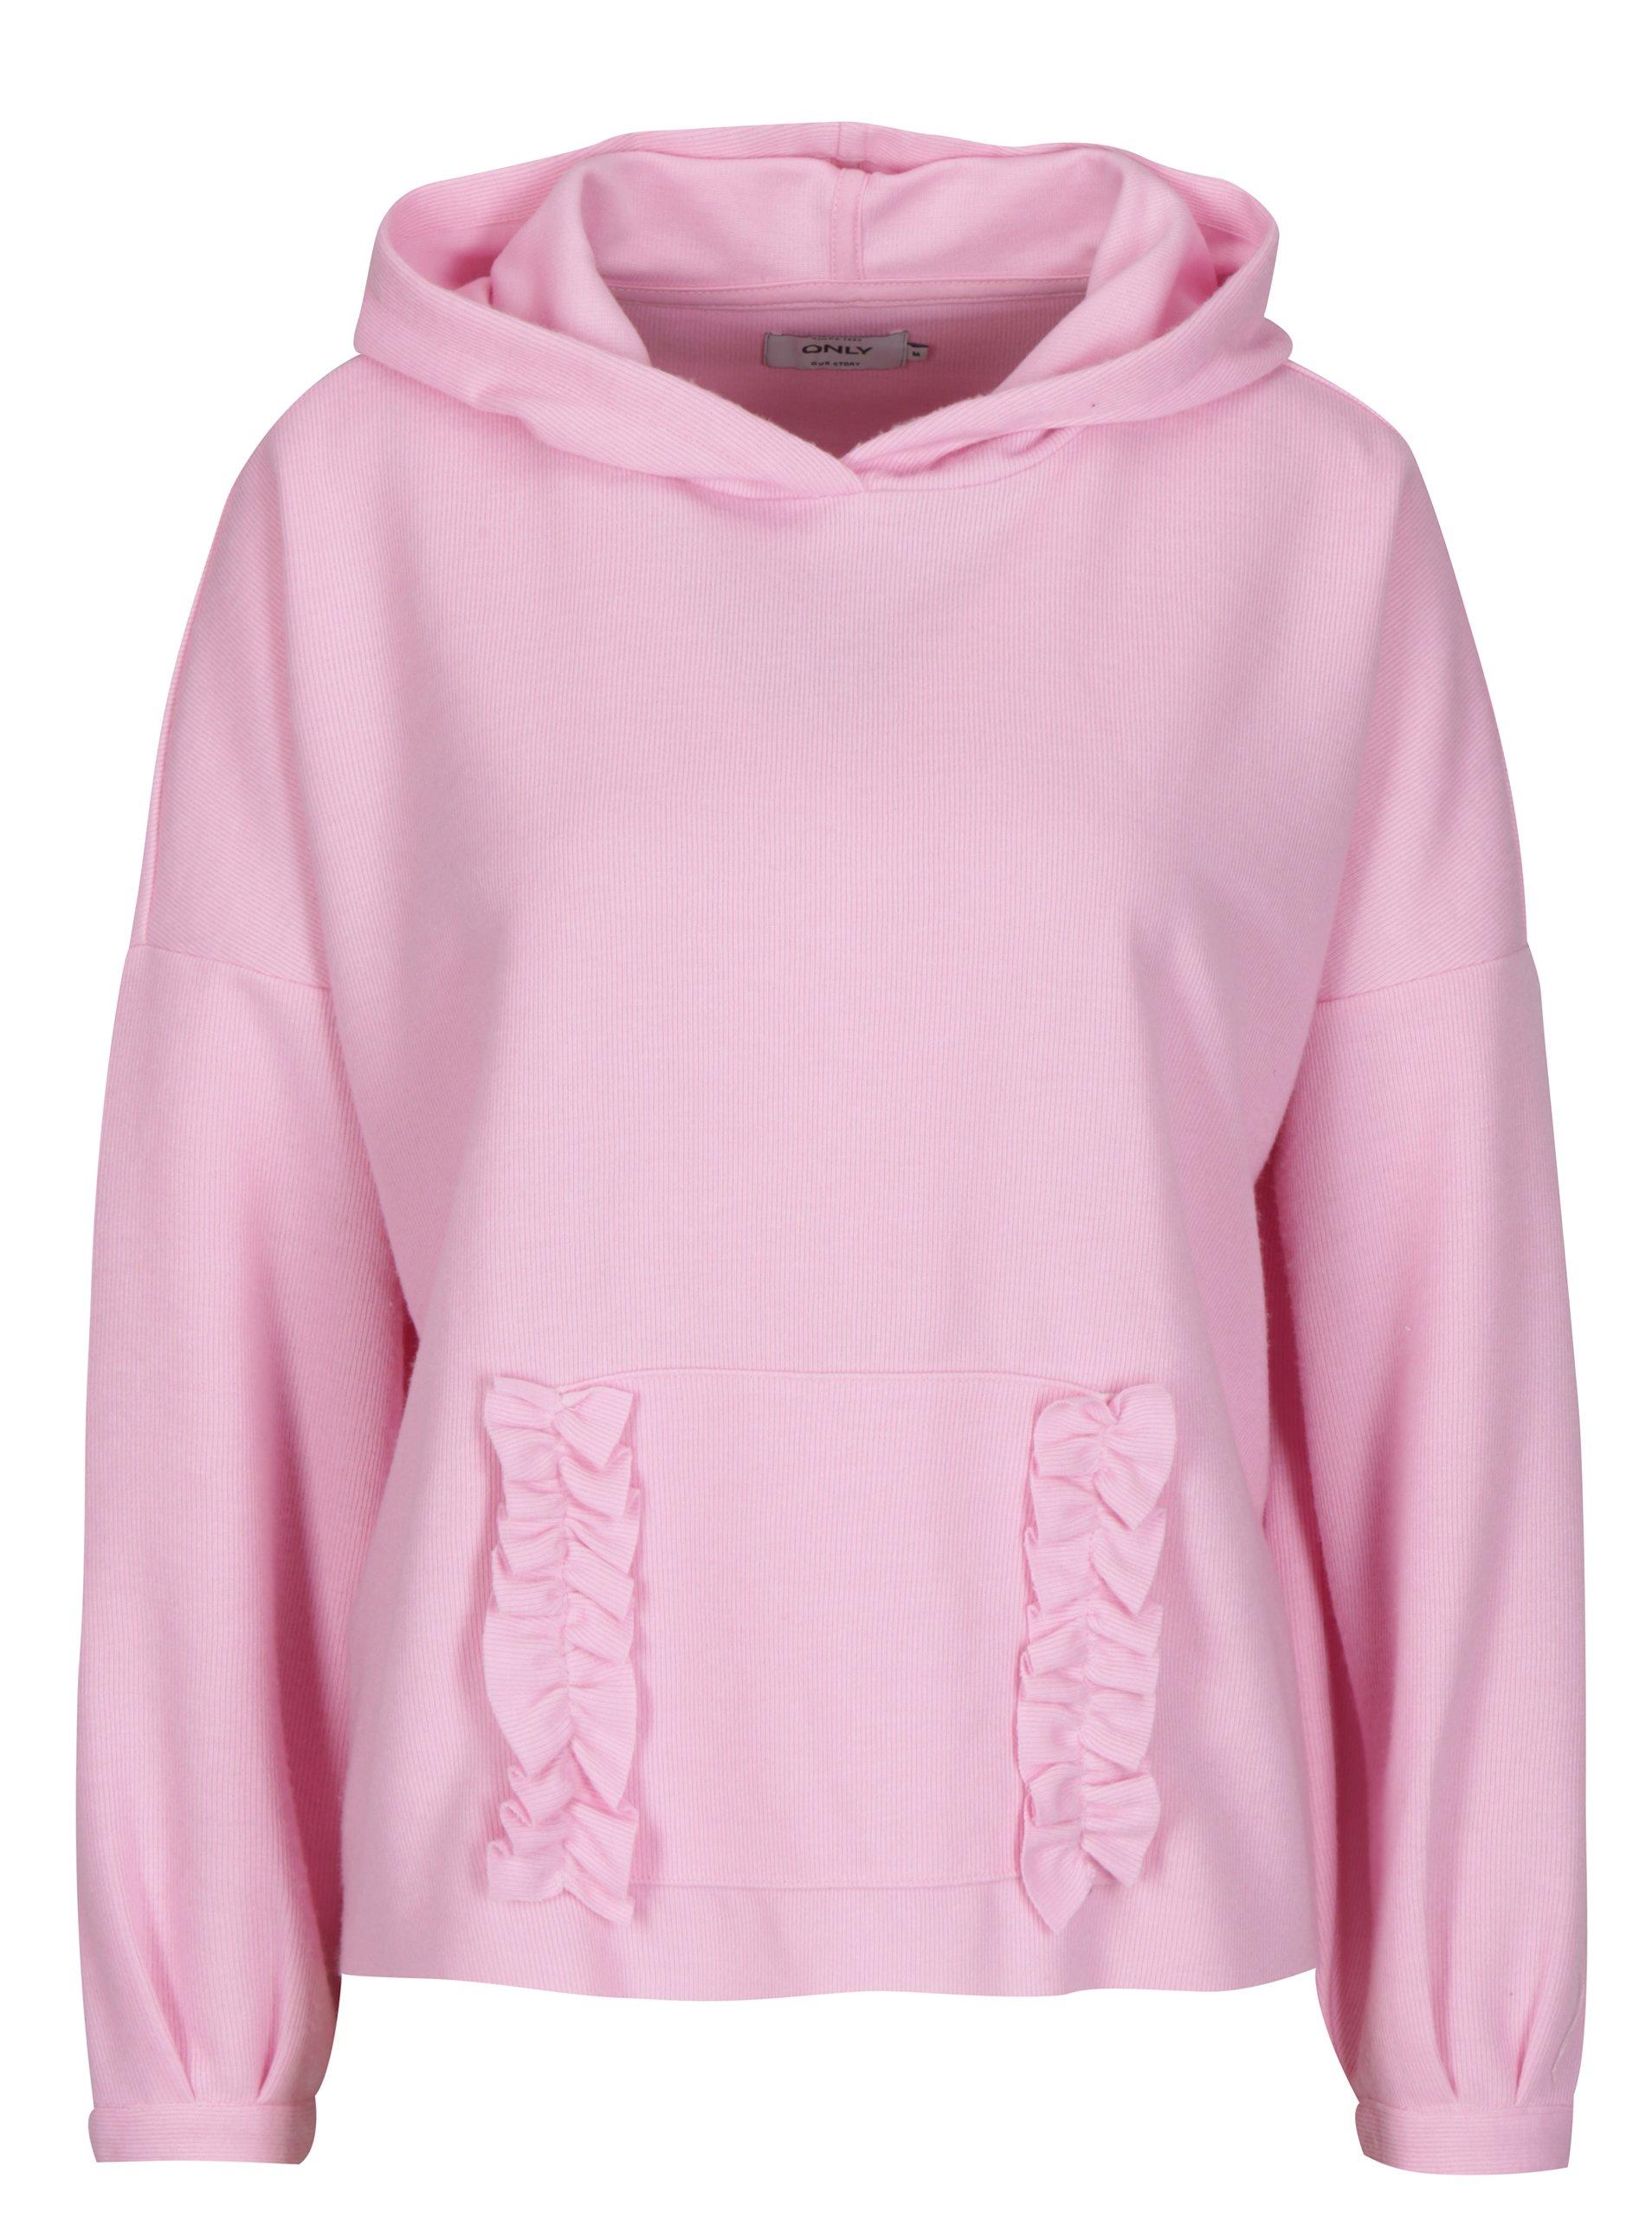 Růžový svetr s kapucí ONLY Gia 980b604489